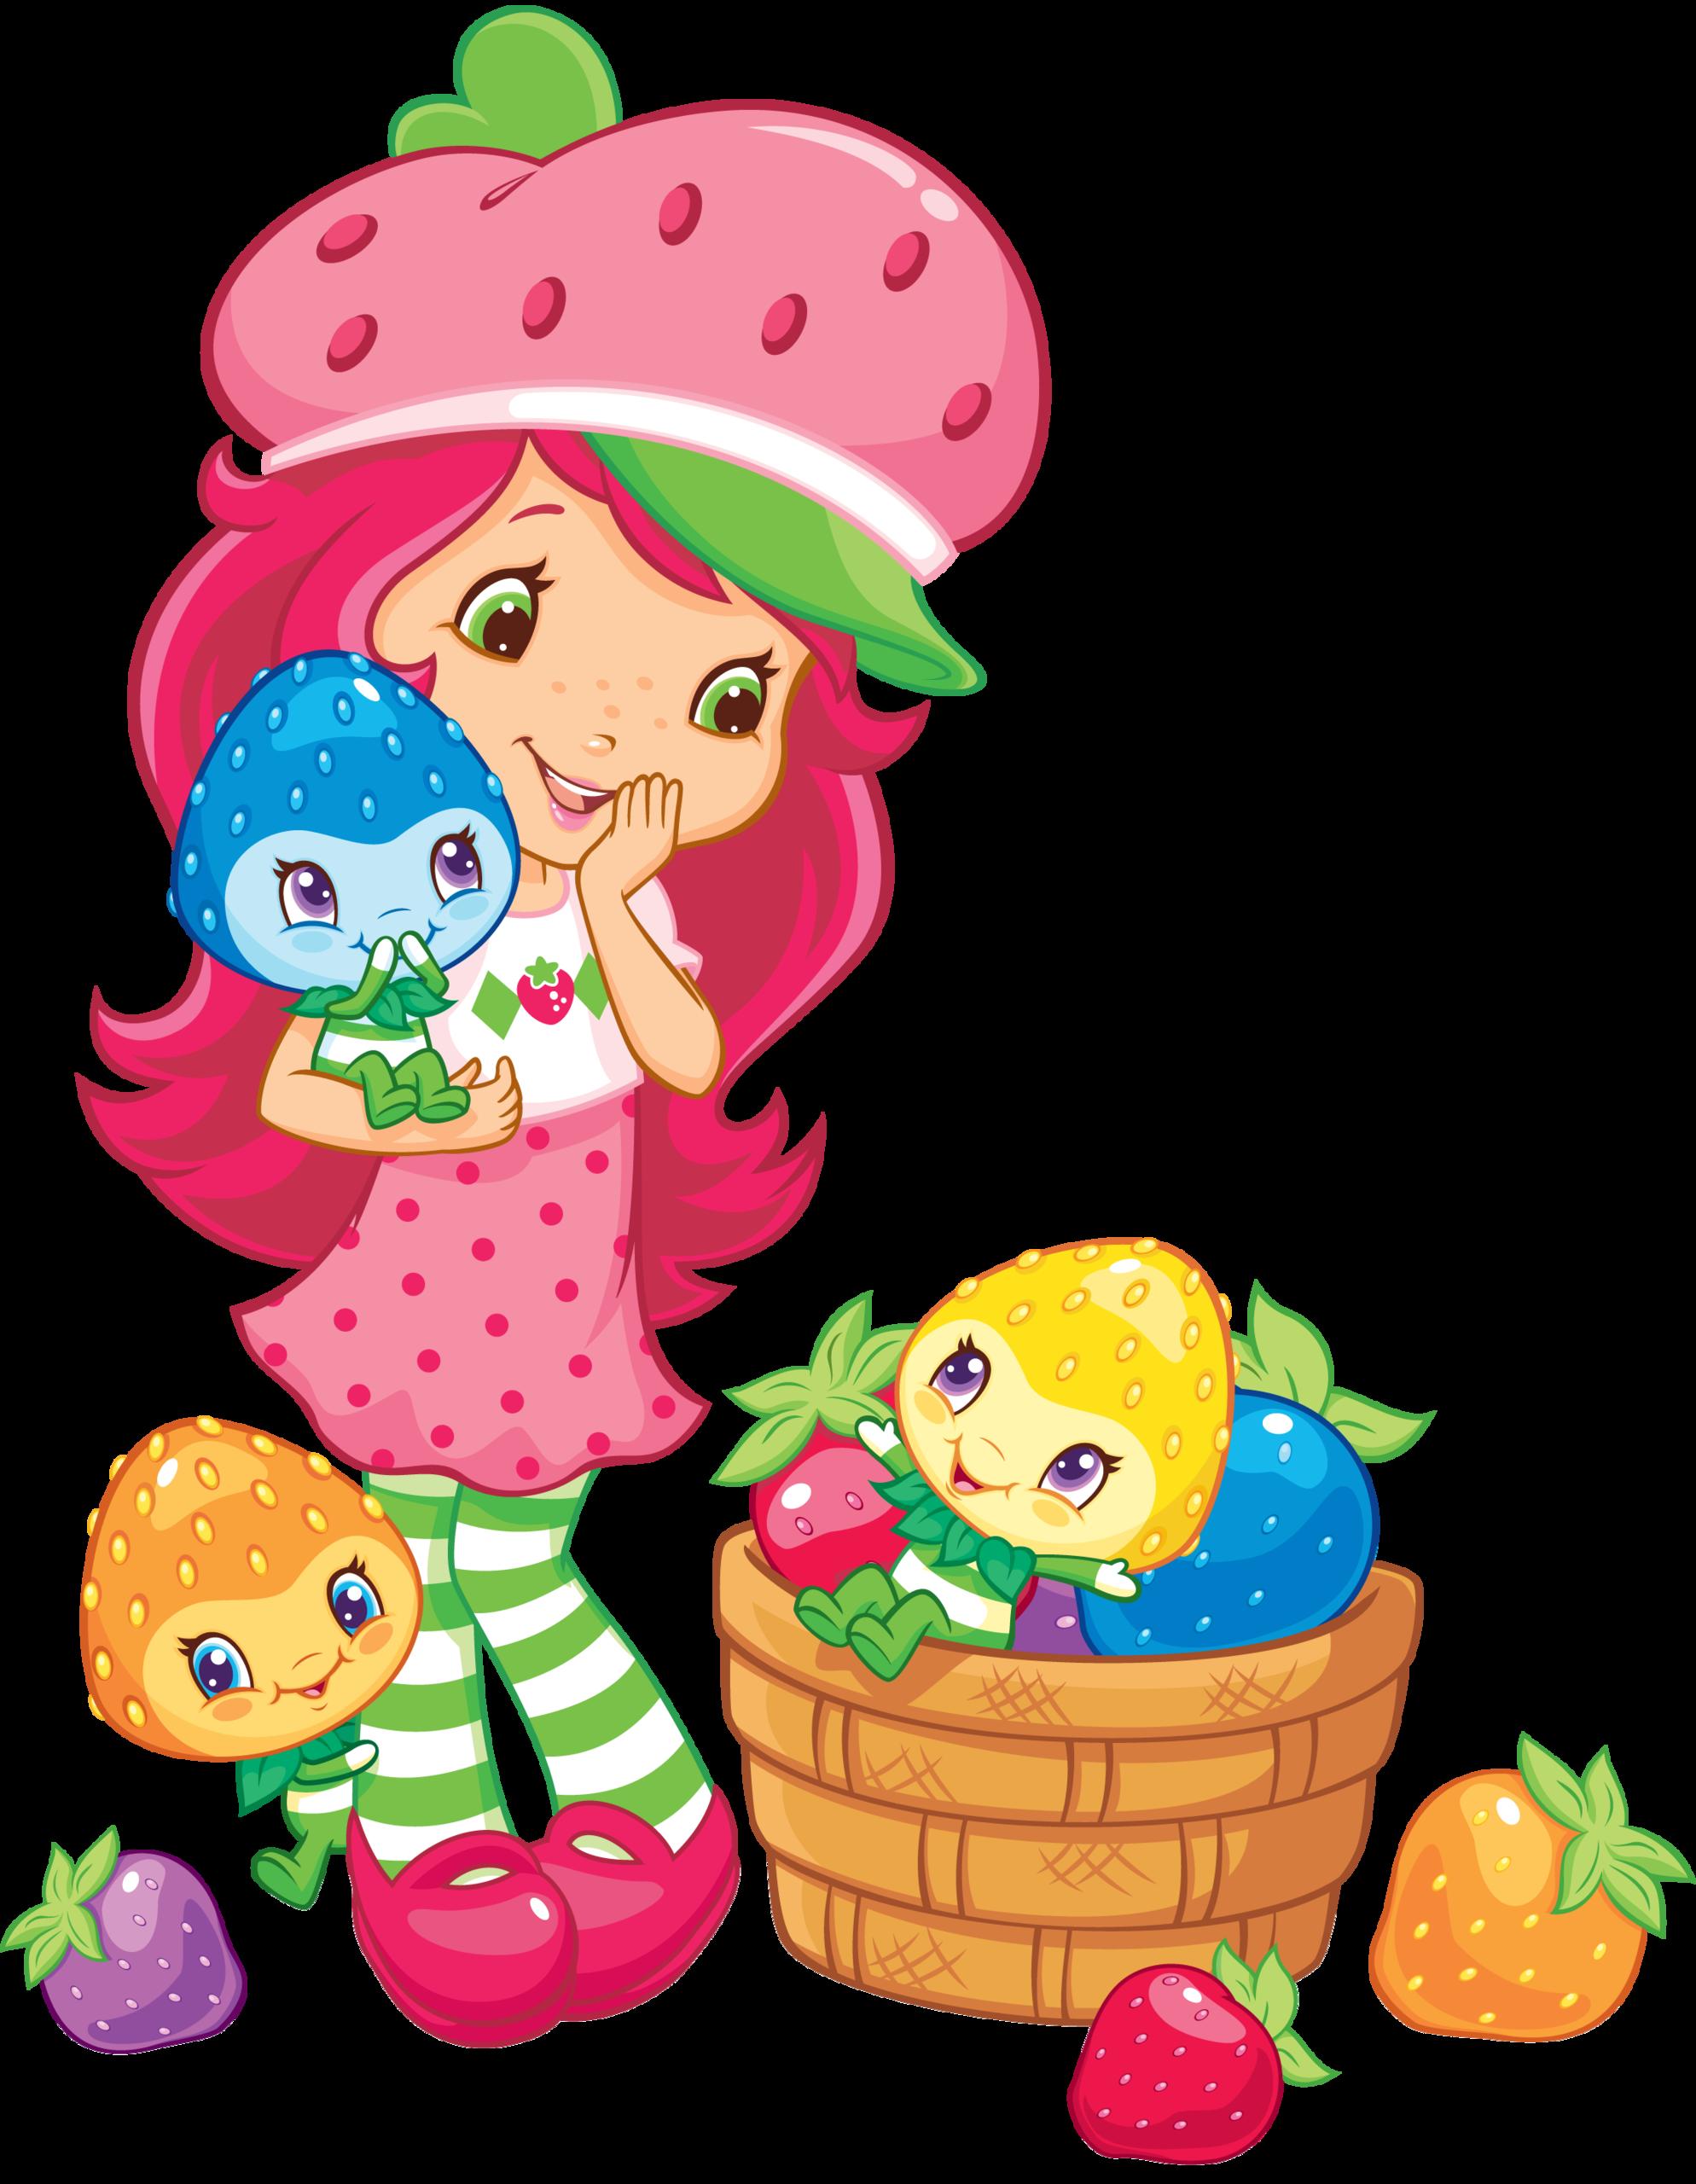 Strawberry Shortcake Backgrounds, Compatible - PC, Mobile, Gadgets| 1988x2560 px